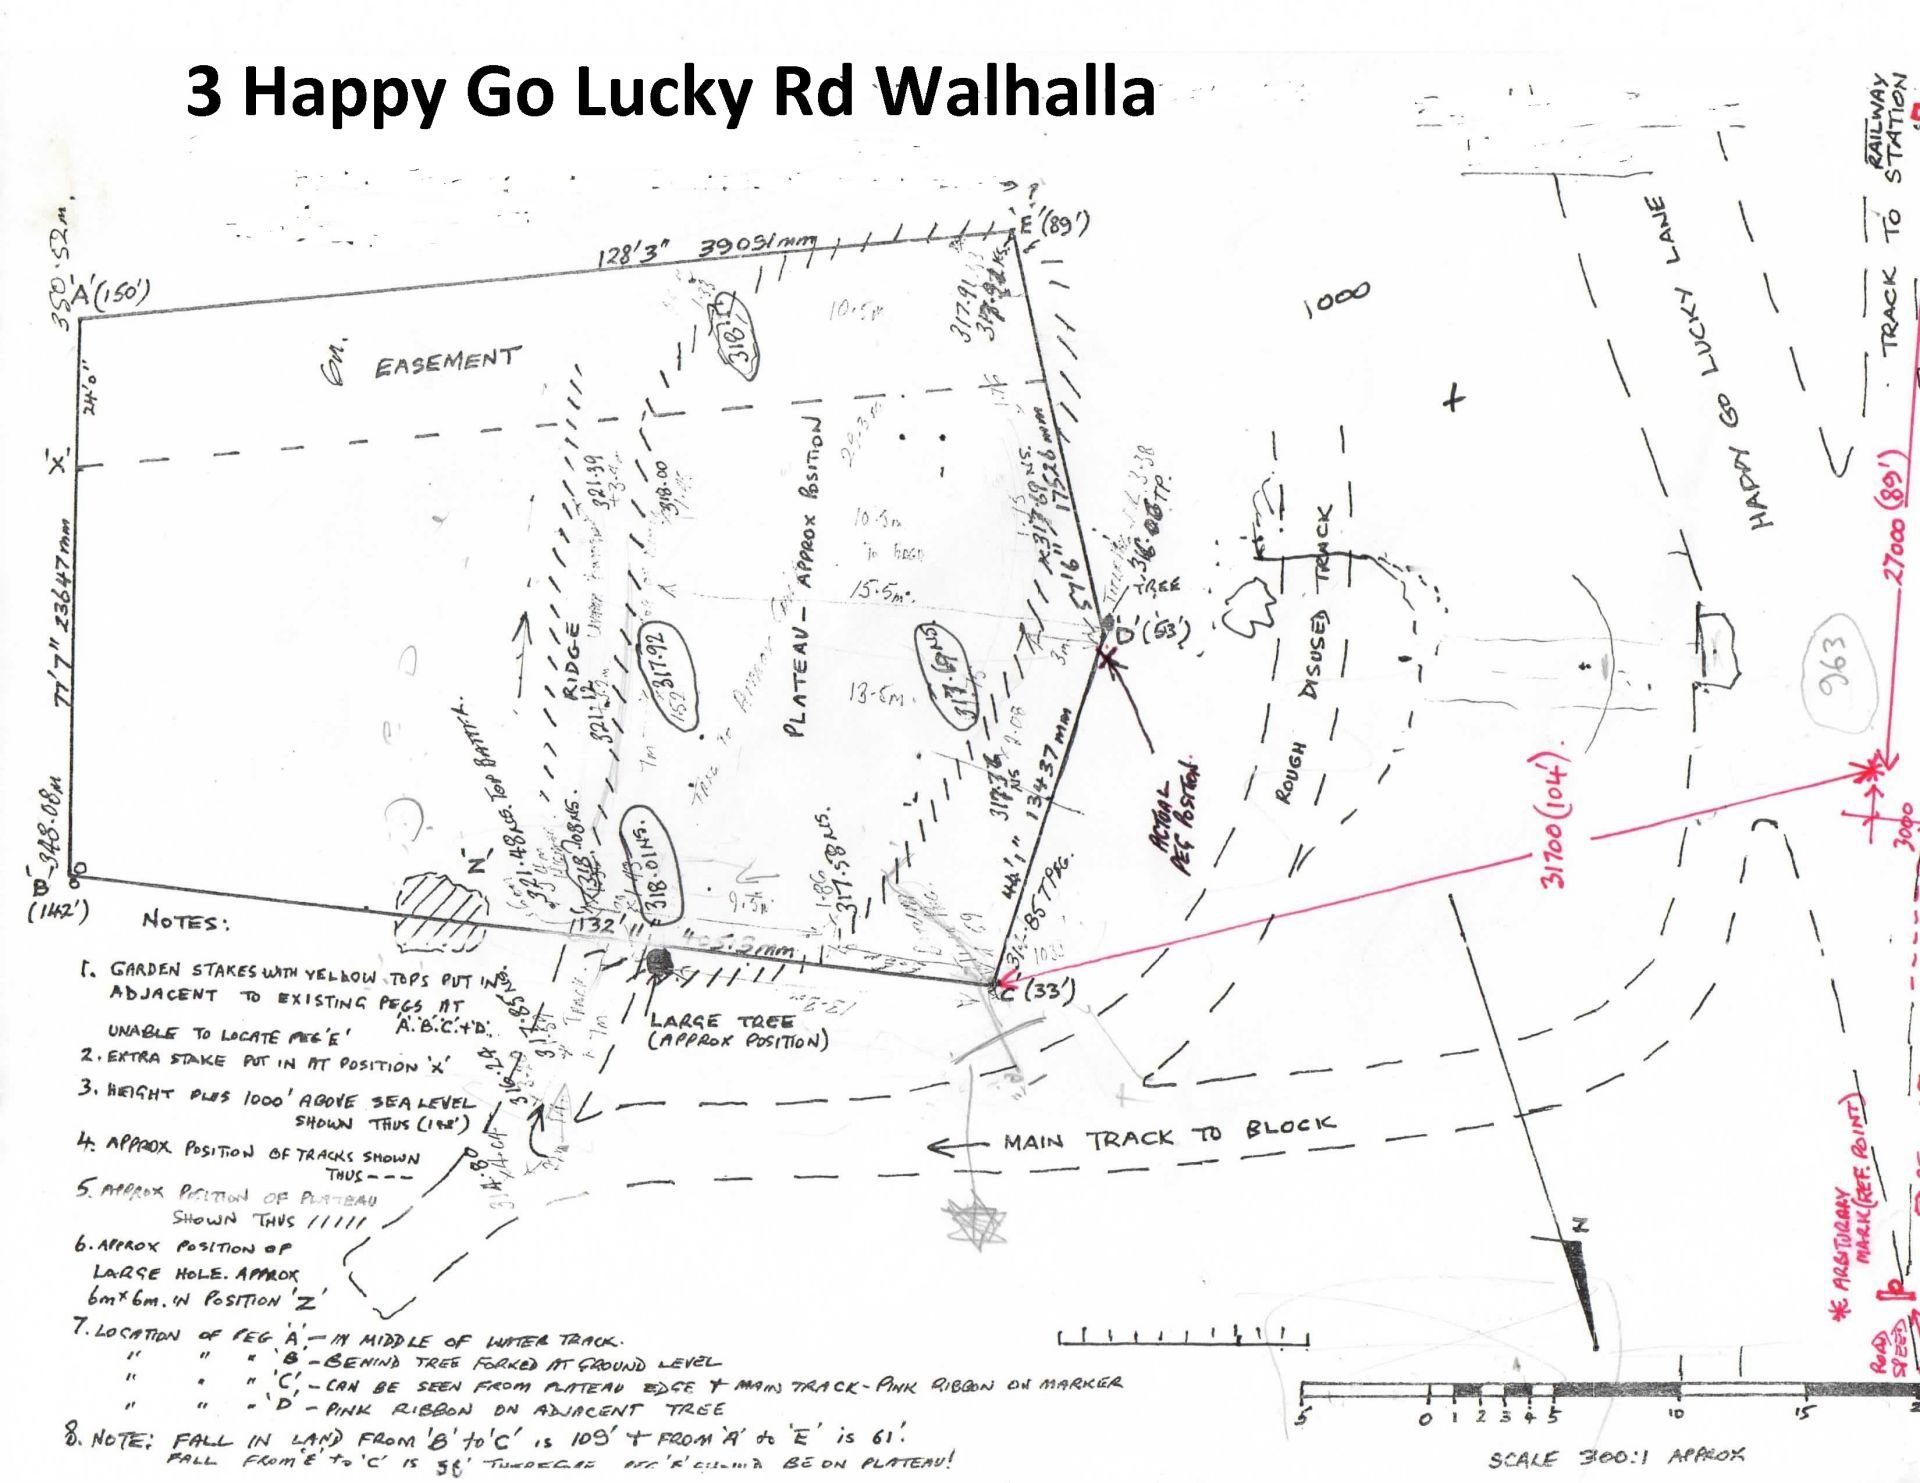 WALHALLA, VIC 3825